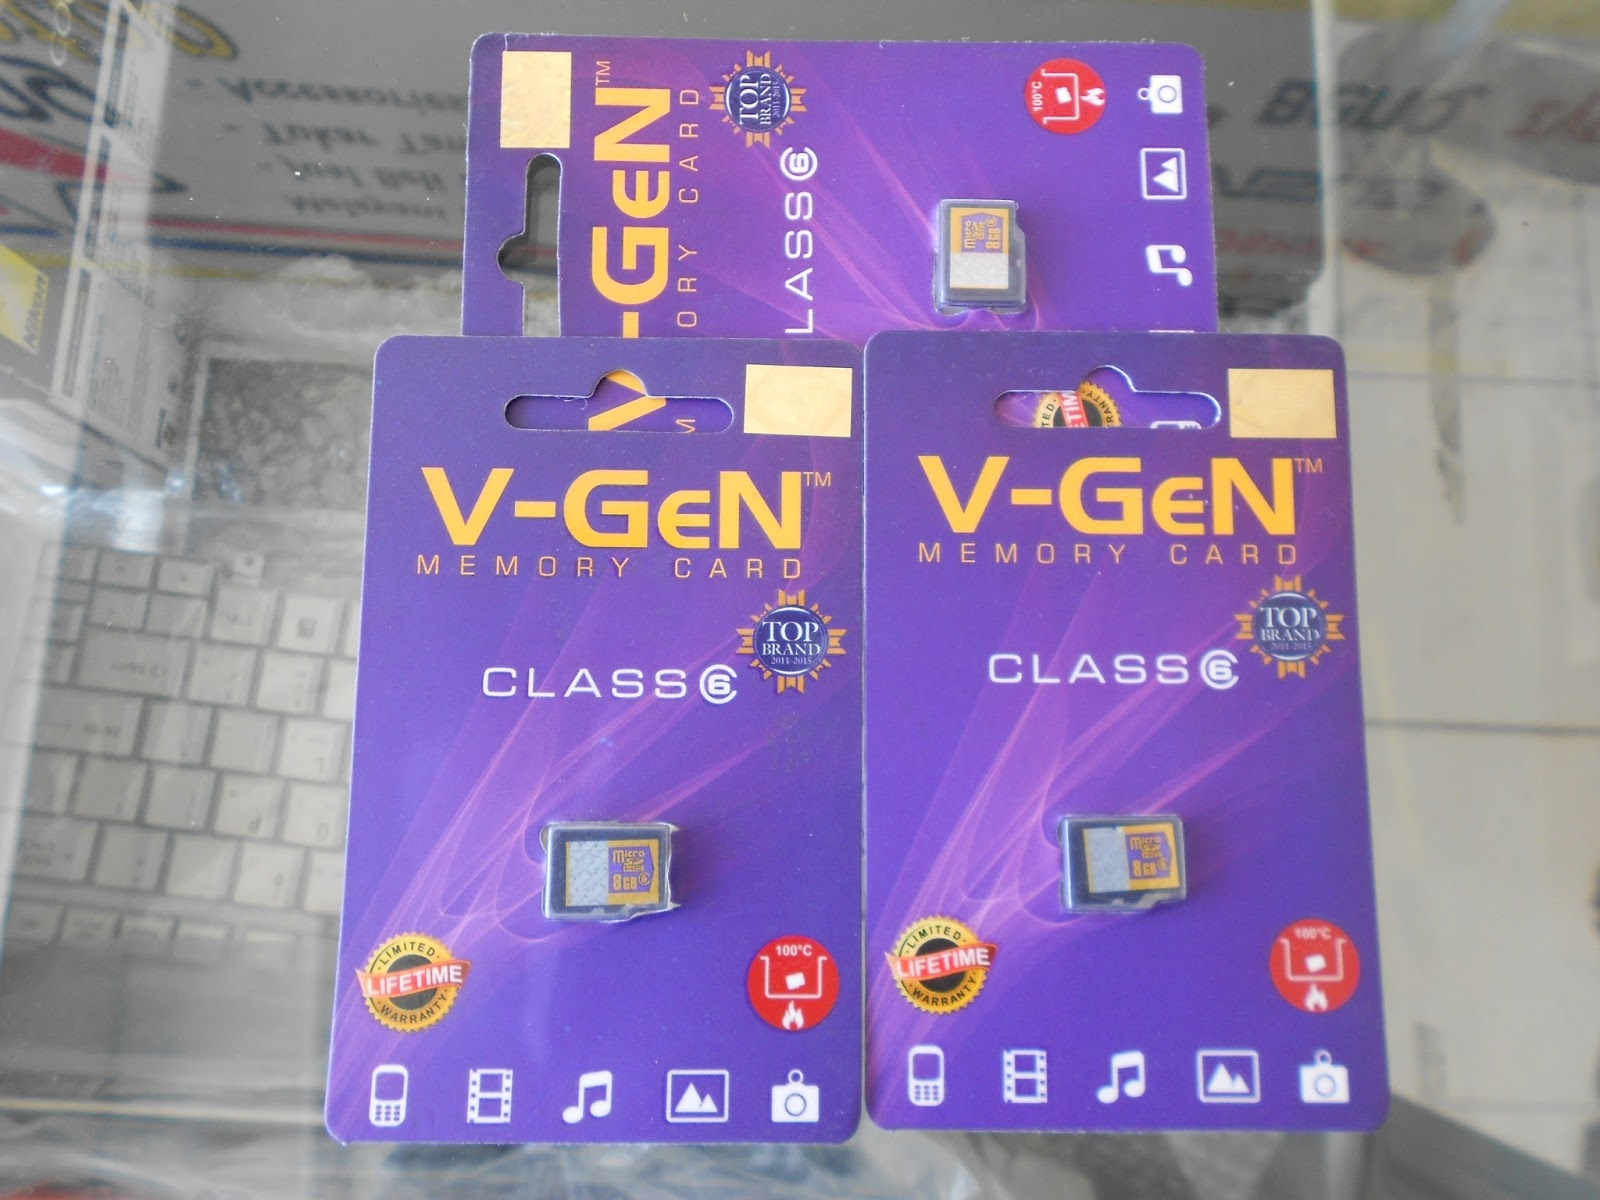 Aneka Cell Praya Memory Dan Flashdisk Vgen 8gb Micro Sd Kelas 6 Tersedia Size 4 8 16